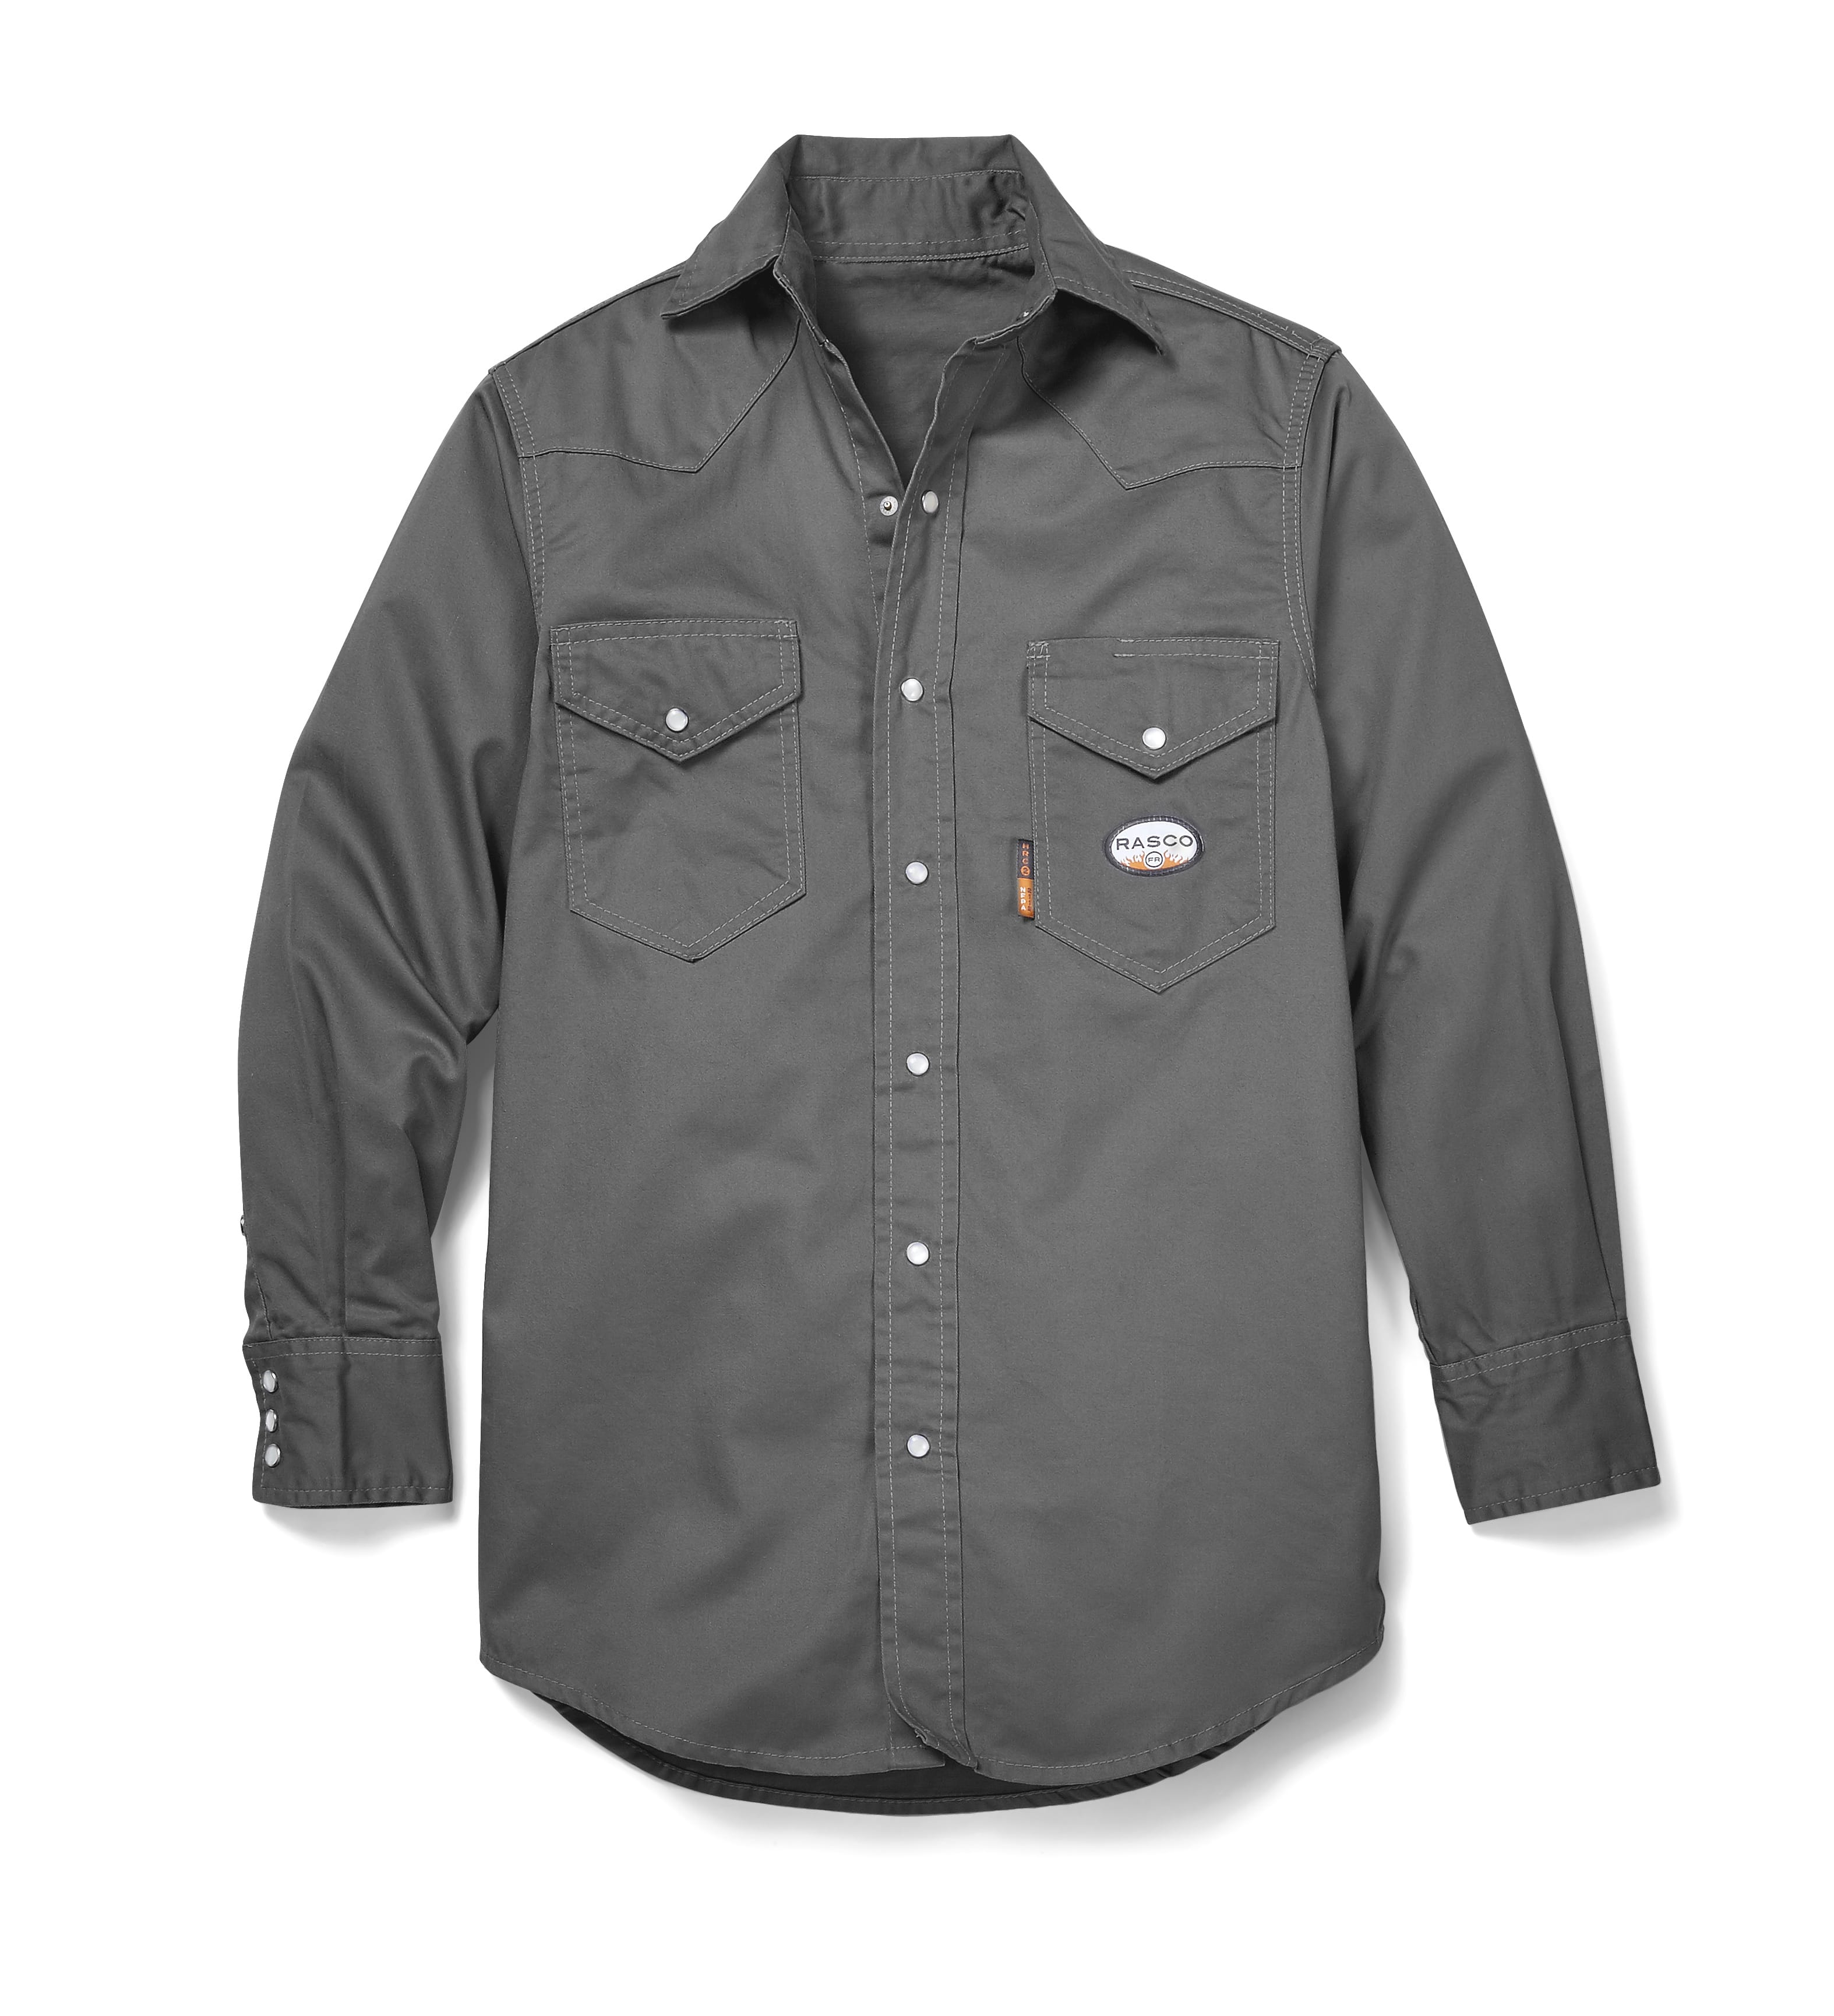 7df1e772f5ee Fire Resistant Rasco Lightweight Gray Shirt